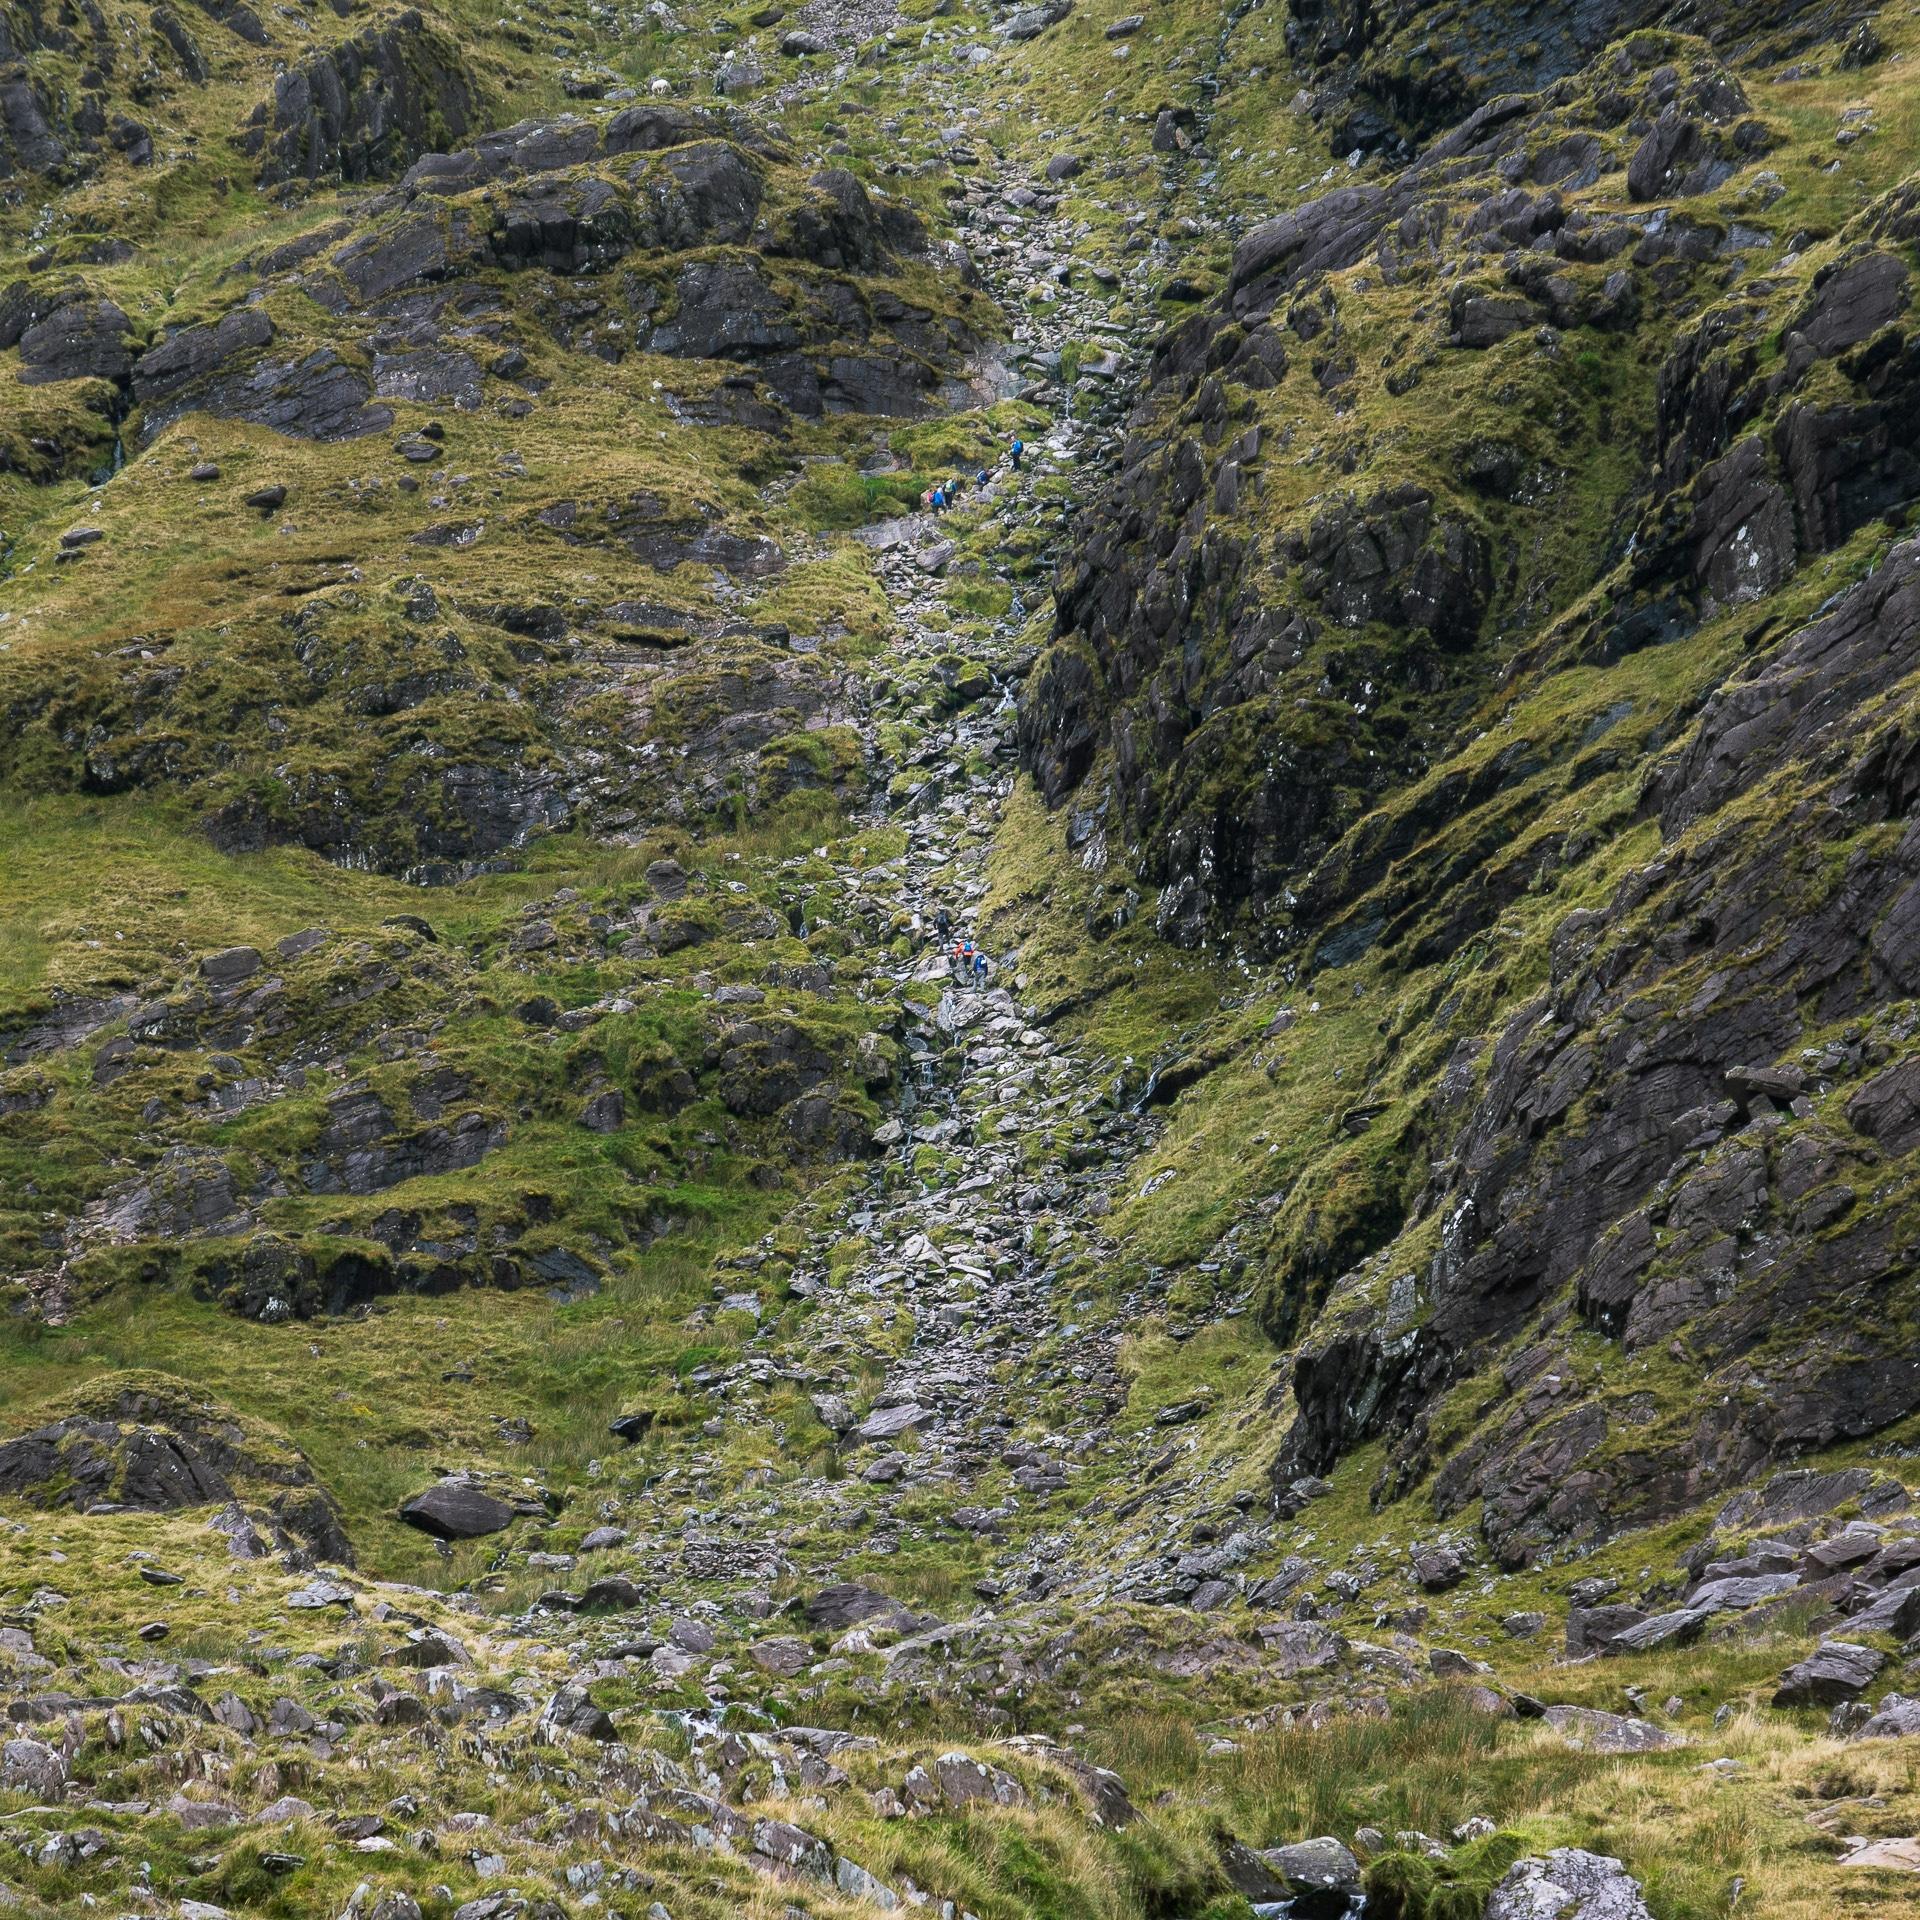 Carrauntoohil : Hiking to the top of Ireland